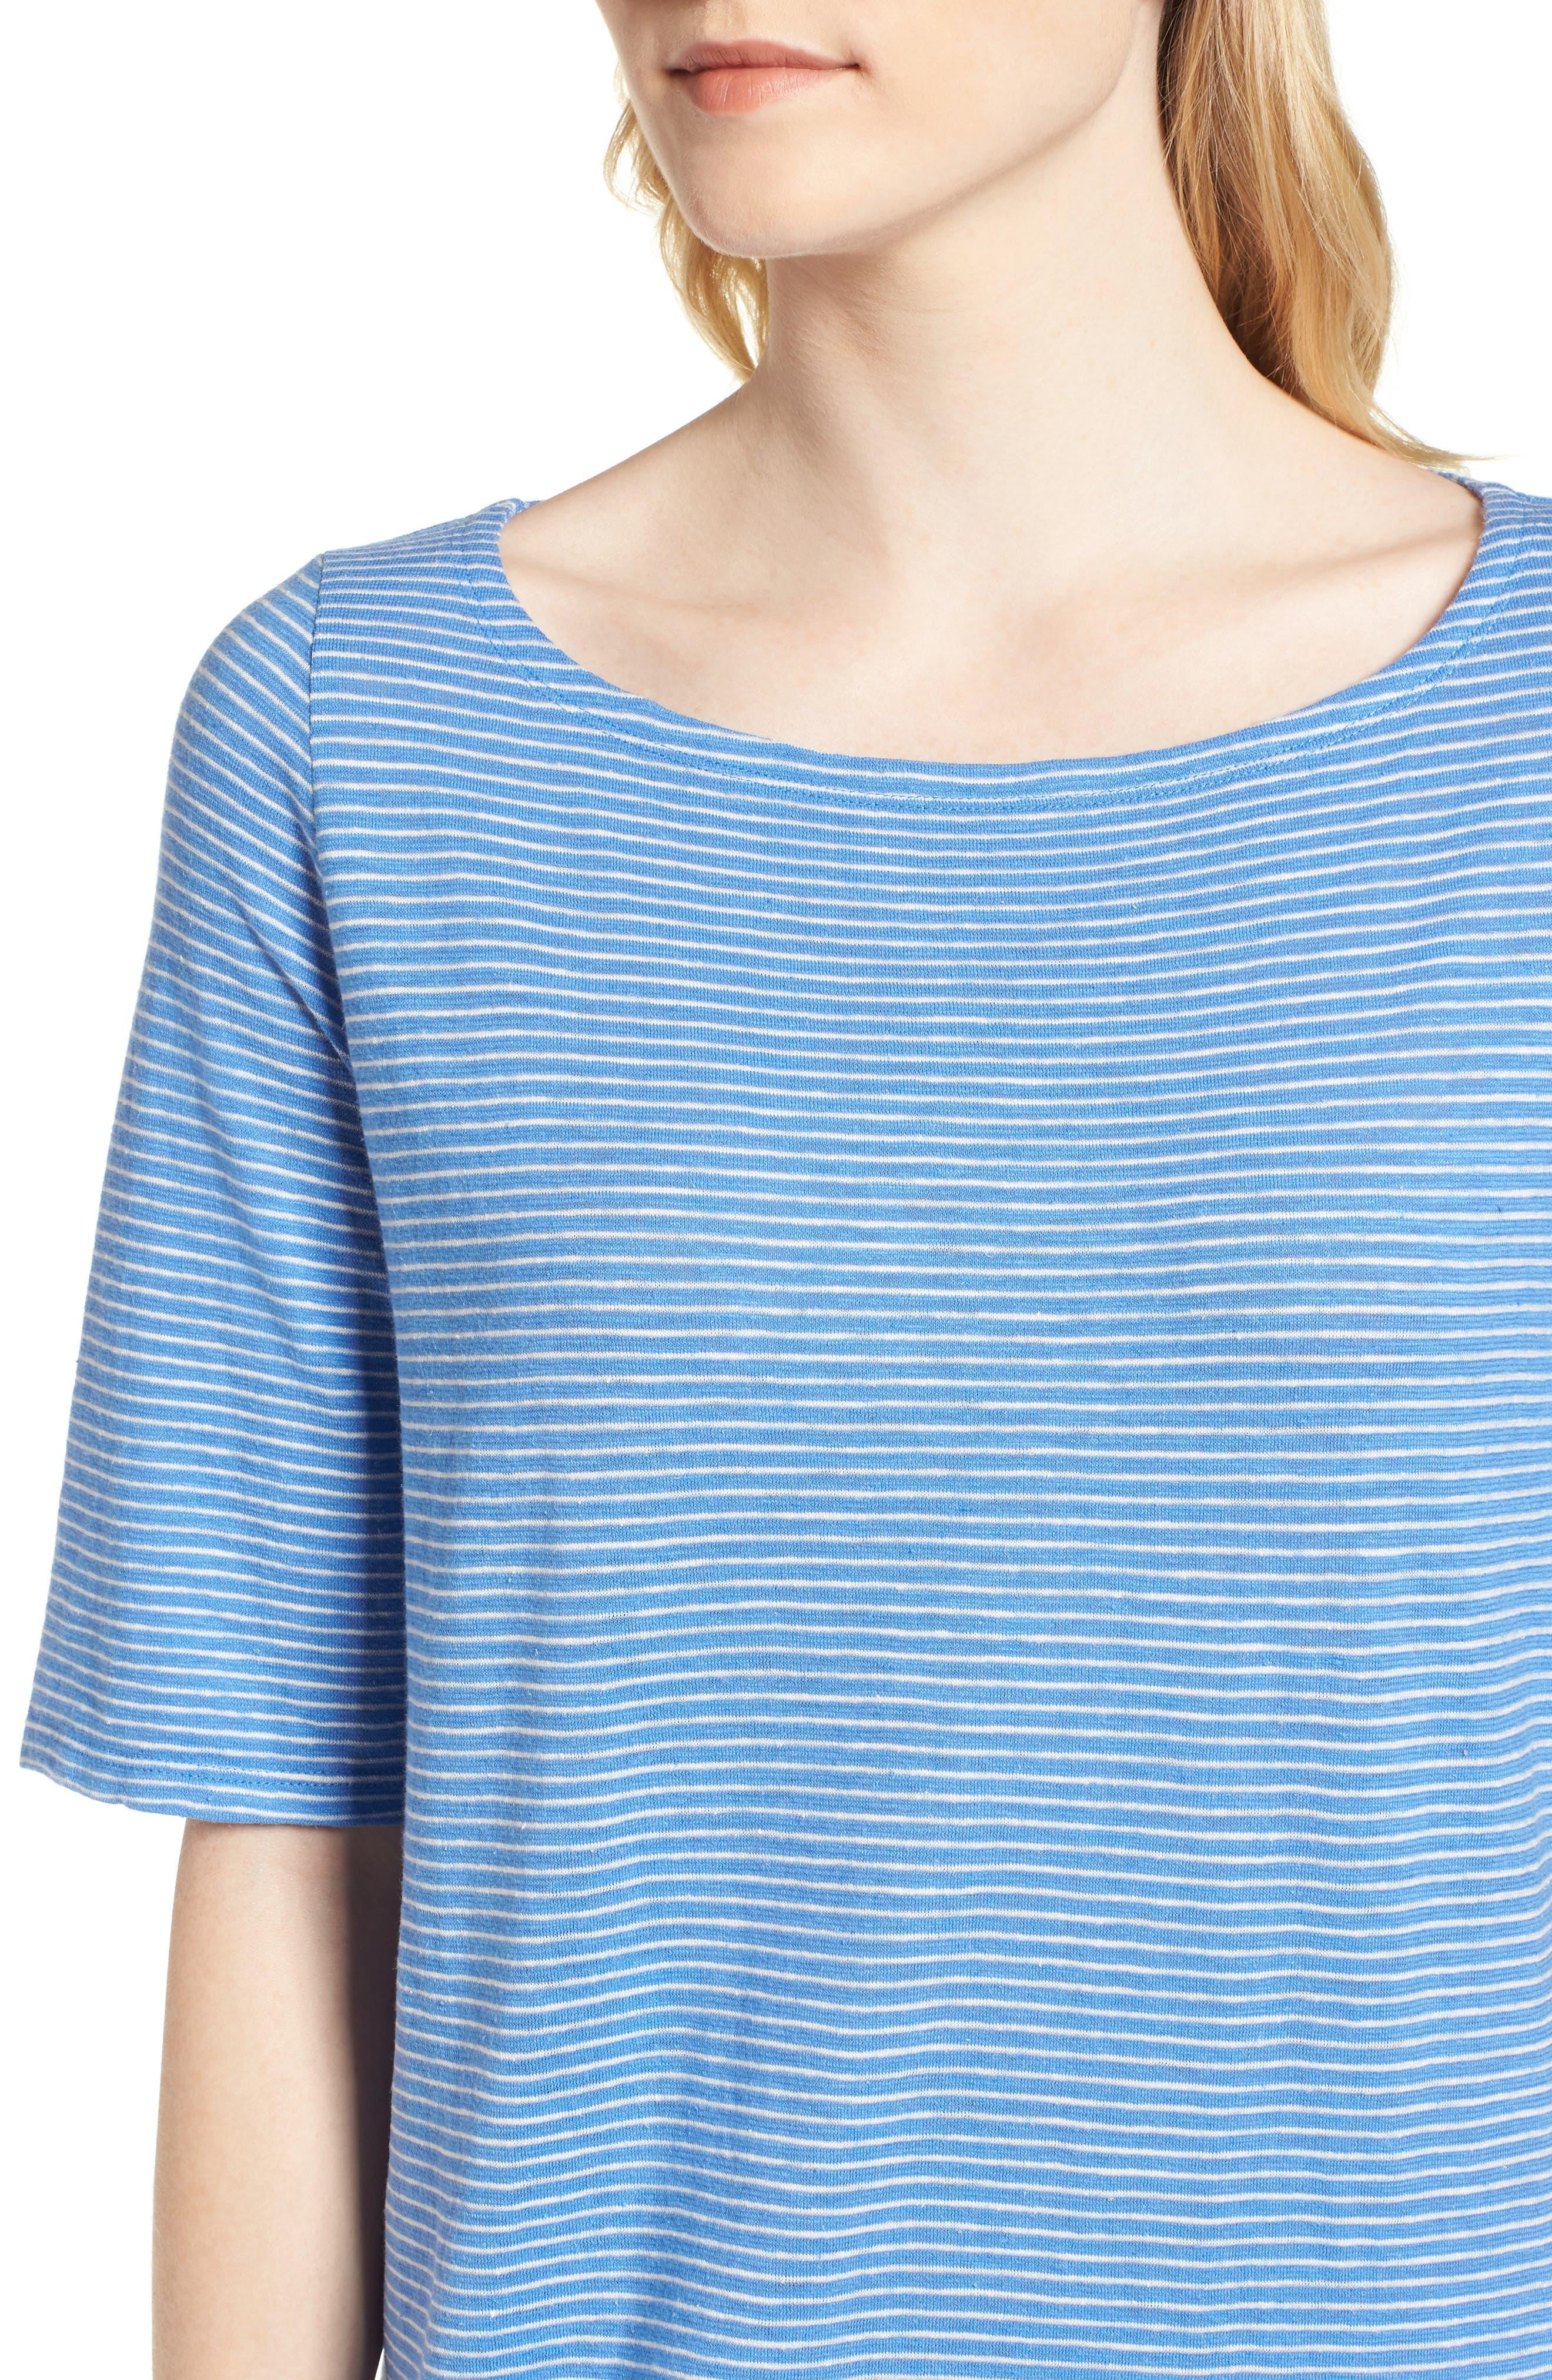 Hemp & Organic Cotton Jersey Dress,                             Alternate thumbnail 4, color,                             Bluebell